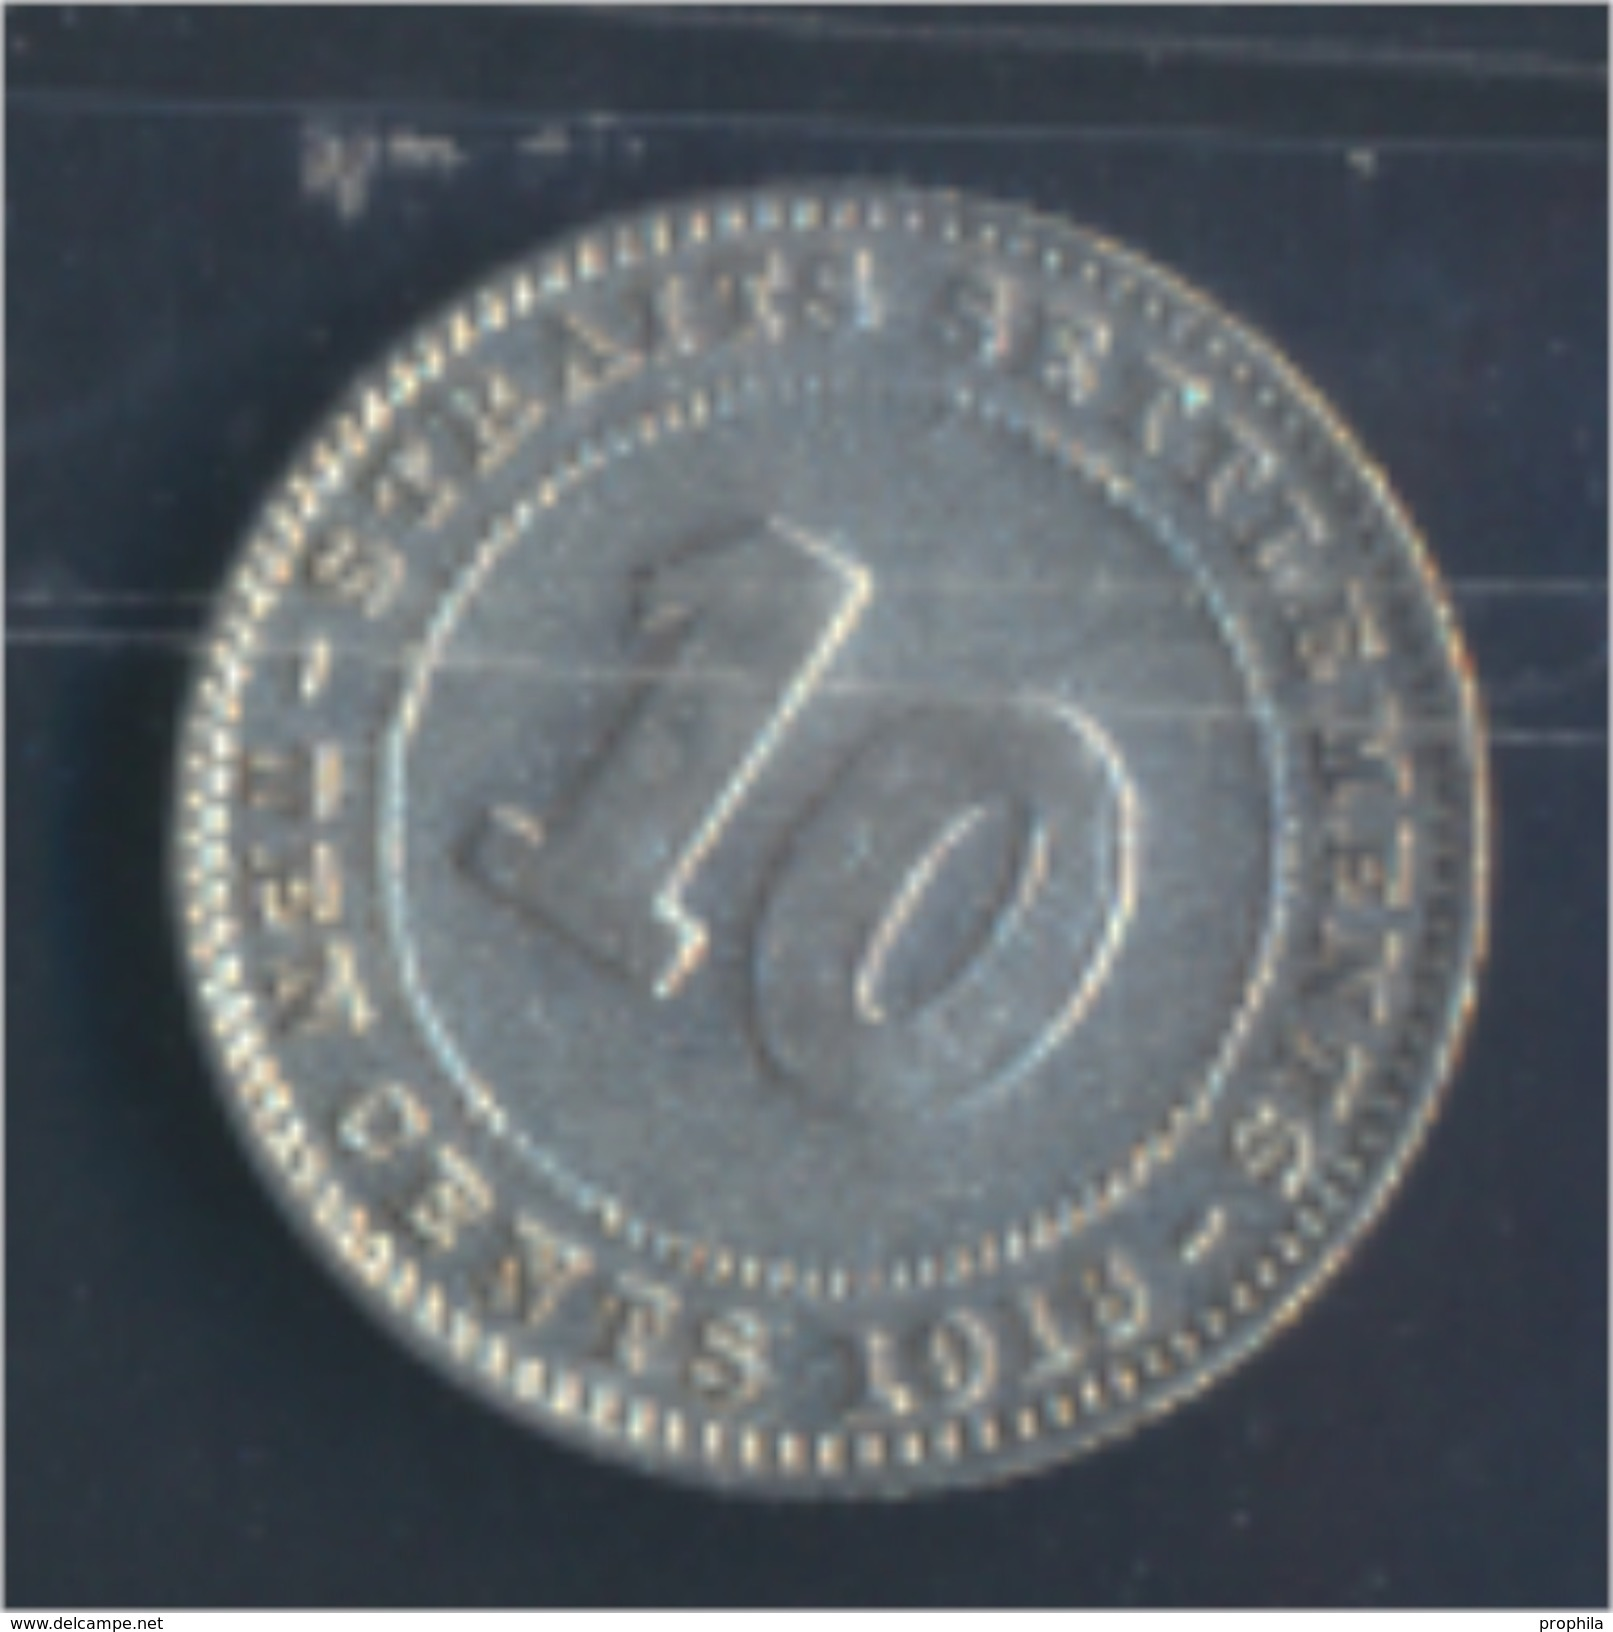 Straits Settlements KM-Nr. : 29 1918 Sehr Schön Silber 1918 10 Cents George V. (8977146 - Malaysie